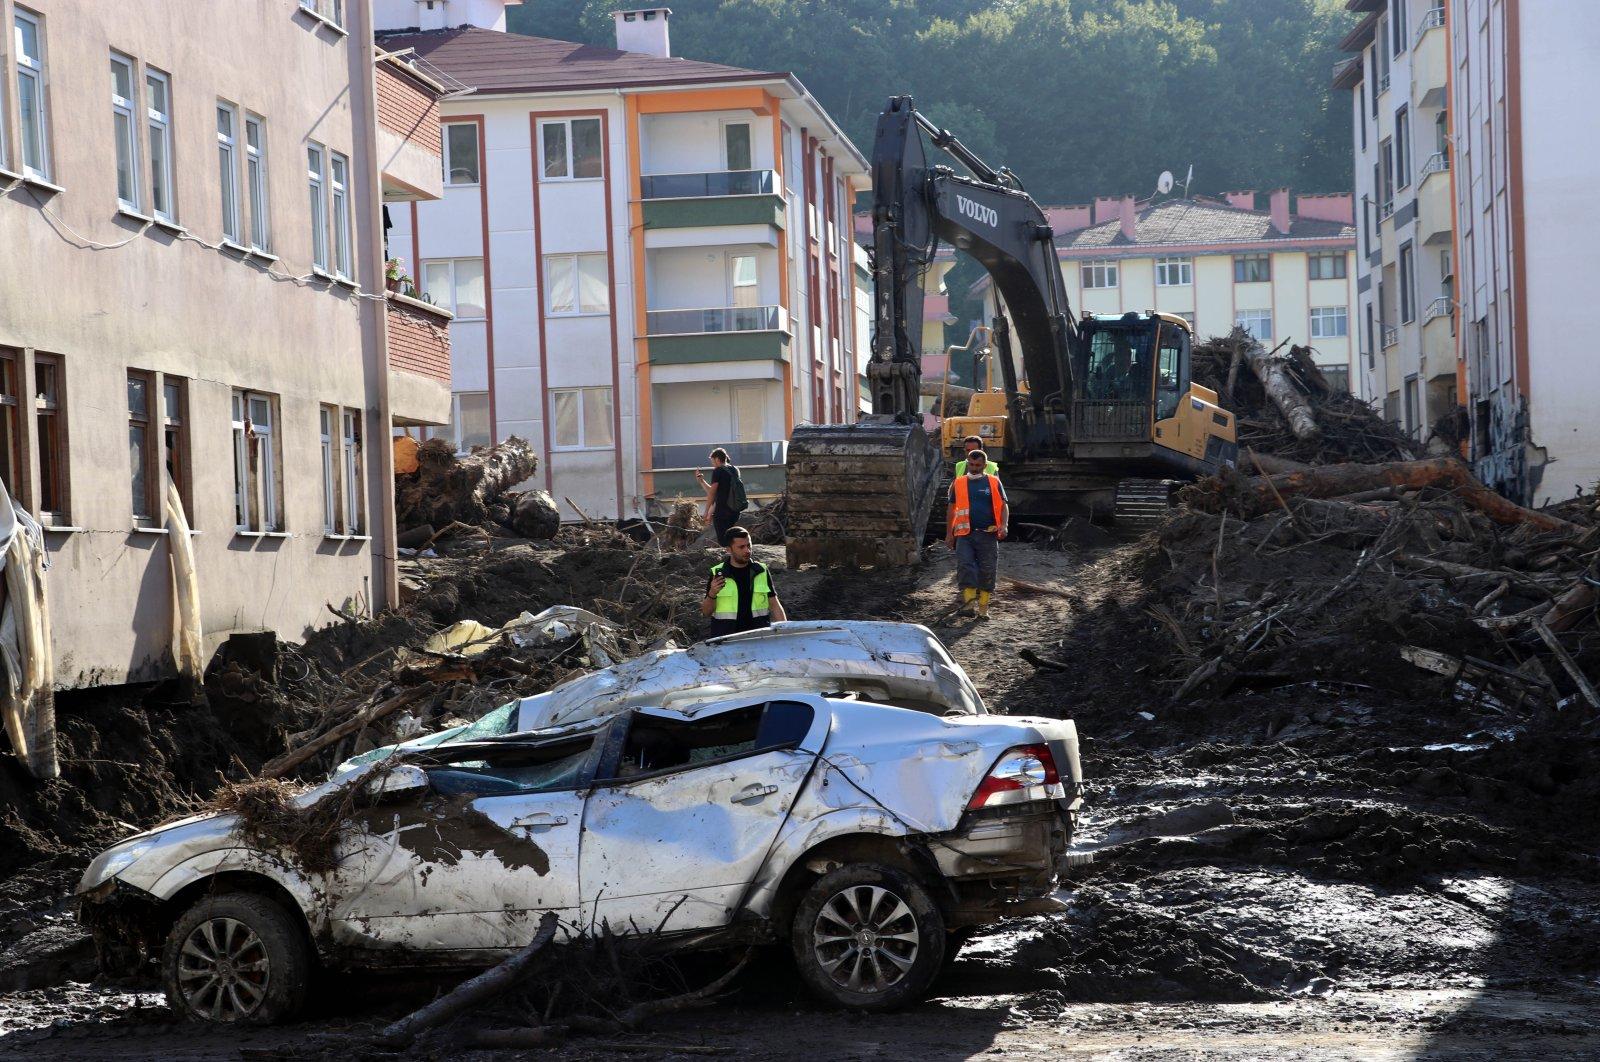 Bulldozers and excavators remove debris from the flood-hit streets, in Bozkurt, in Kastamonu, northern Turkey, Aug. 17, 2021. (AA PHOTO)